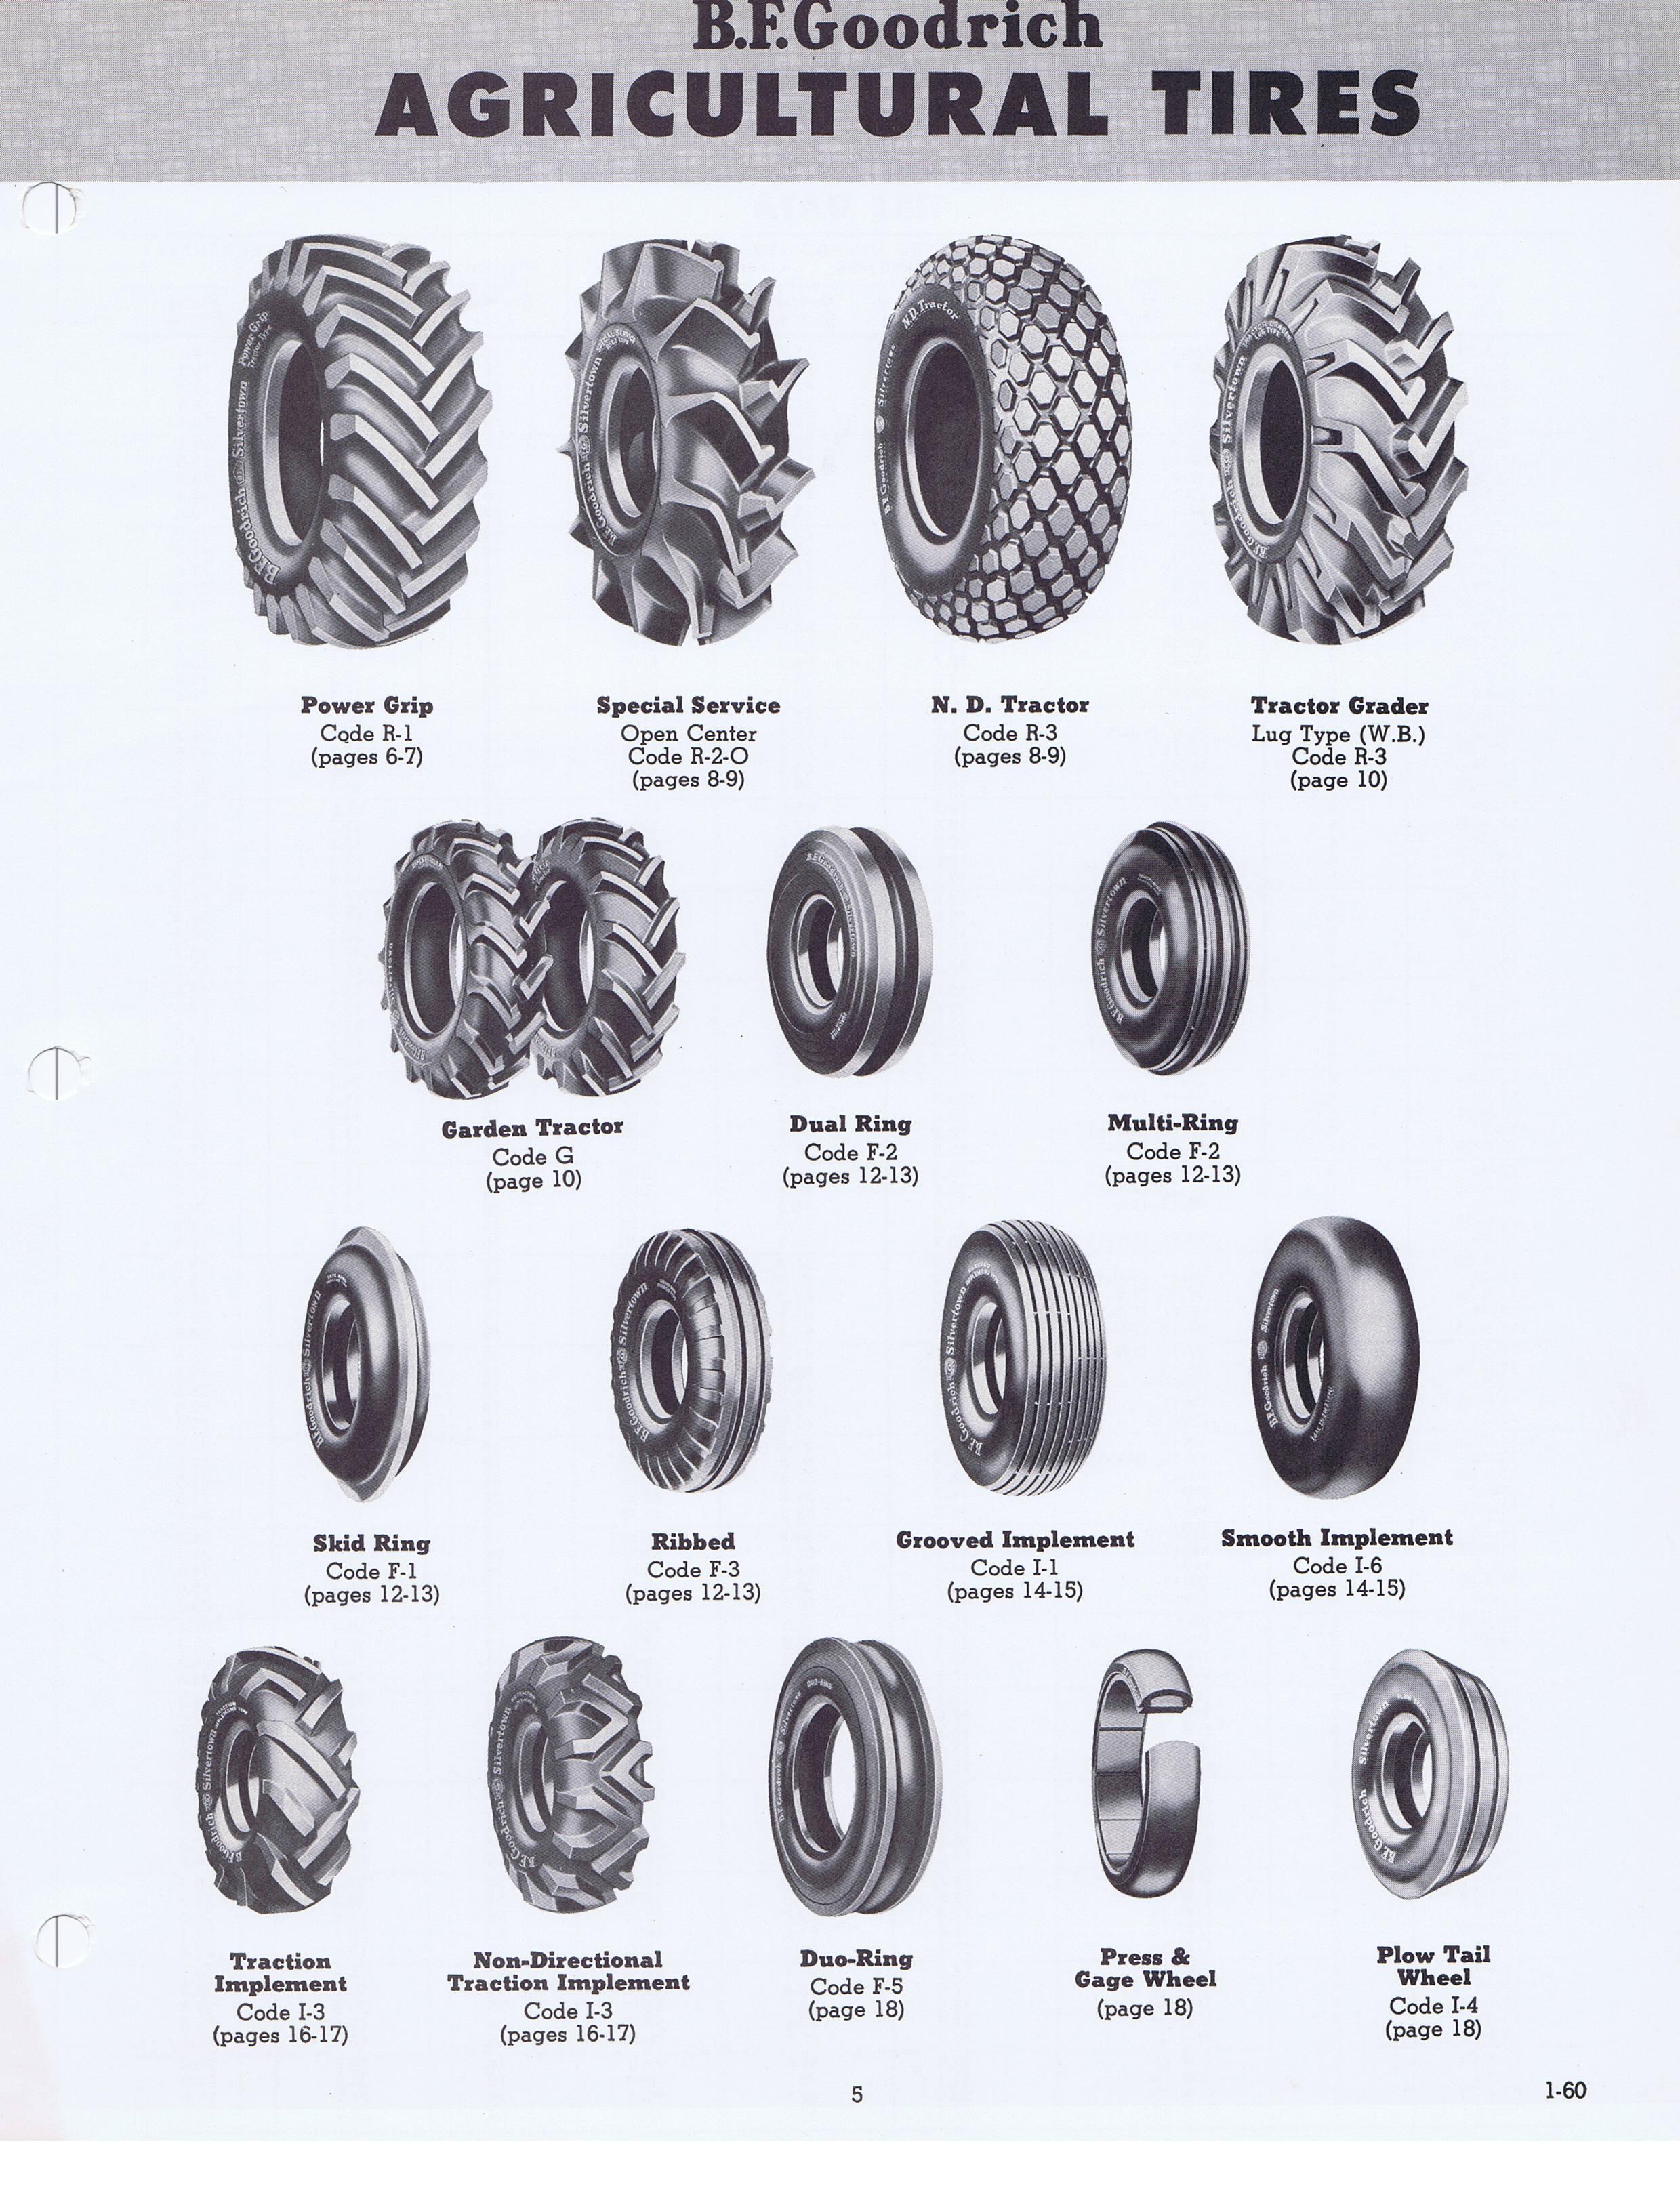 Bf Goodrich At >> 1960 BF Goodrich Agricultural Tires Engineering Data / BFG_Farm_1-60_Page_05.jpg